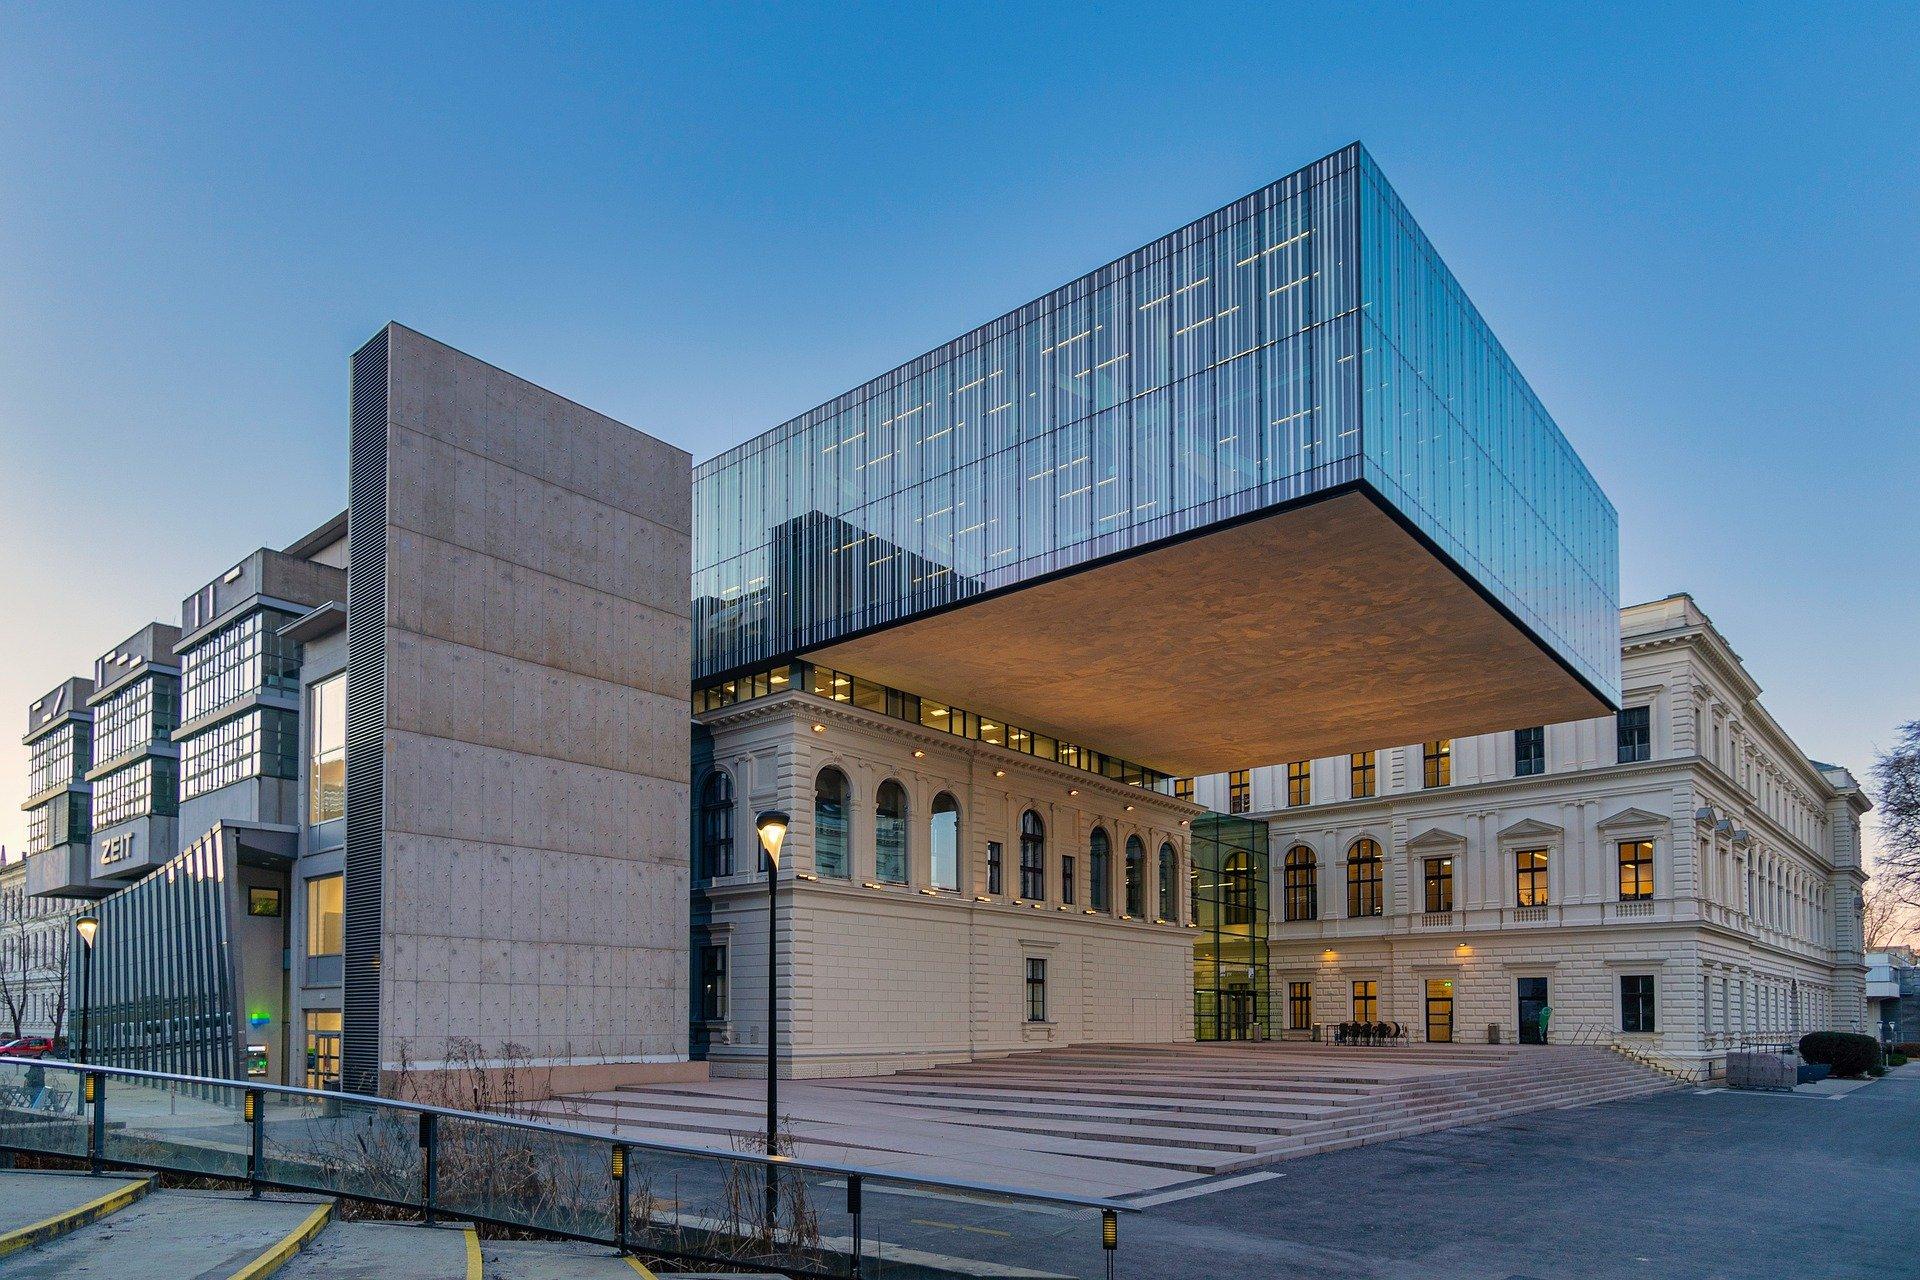 Library of the University of Graz in Austria